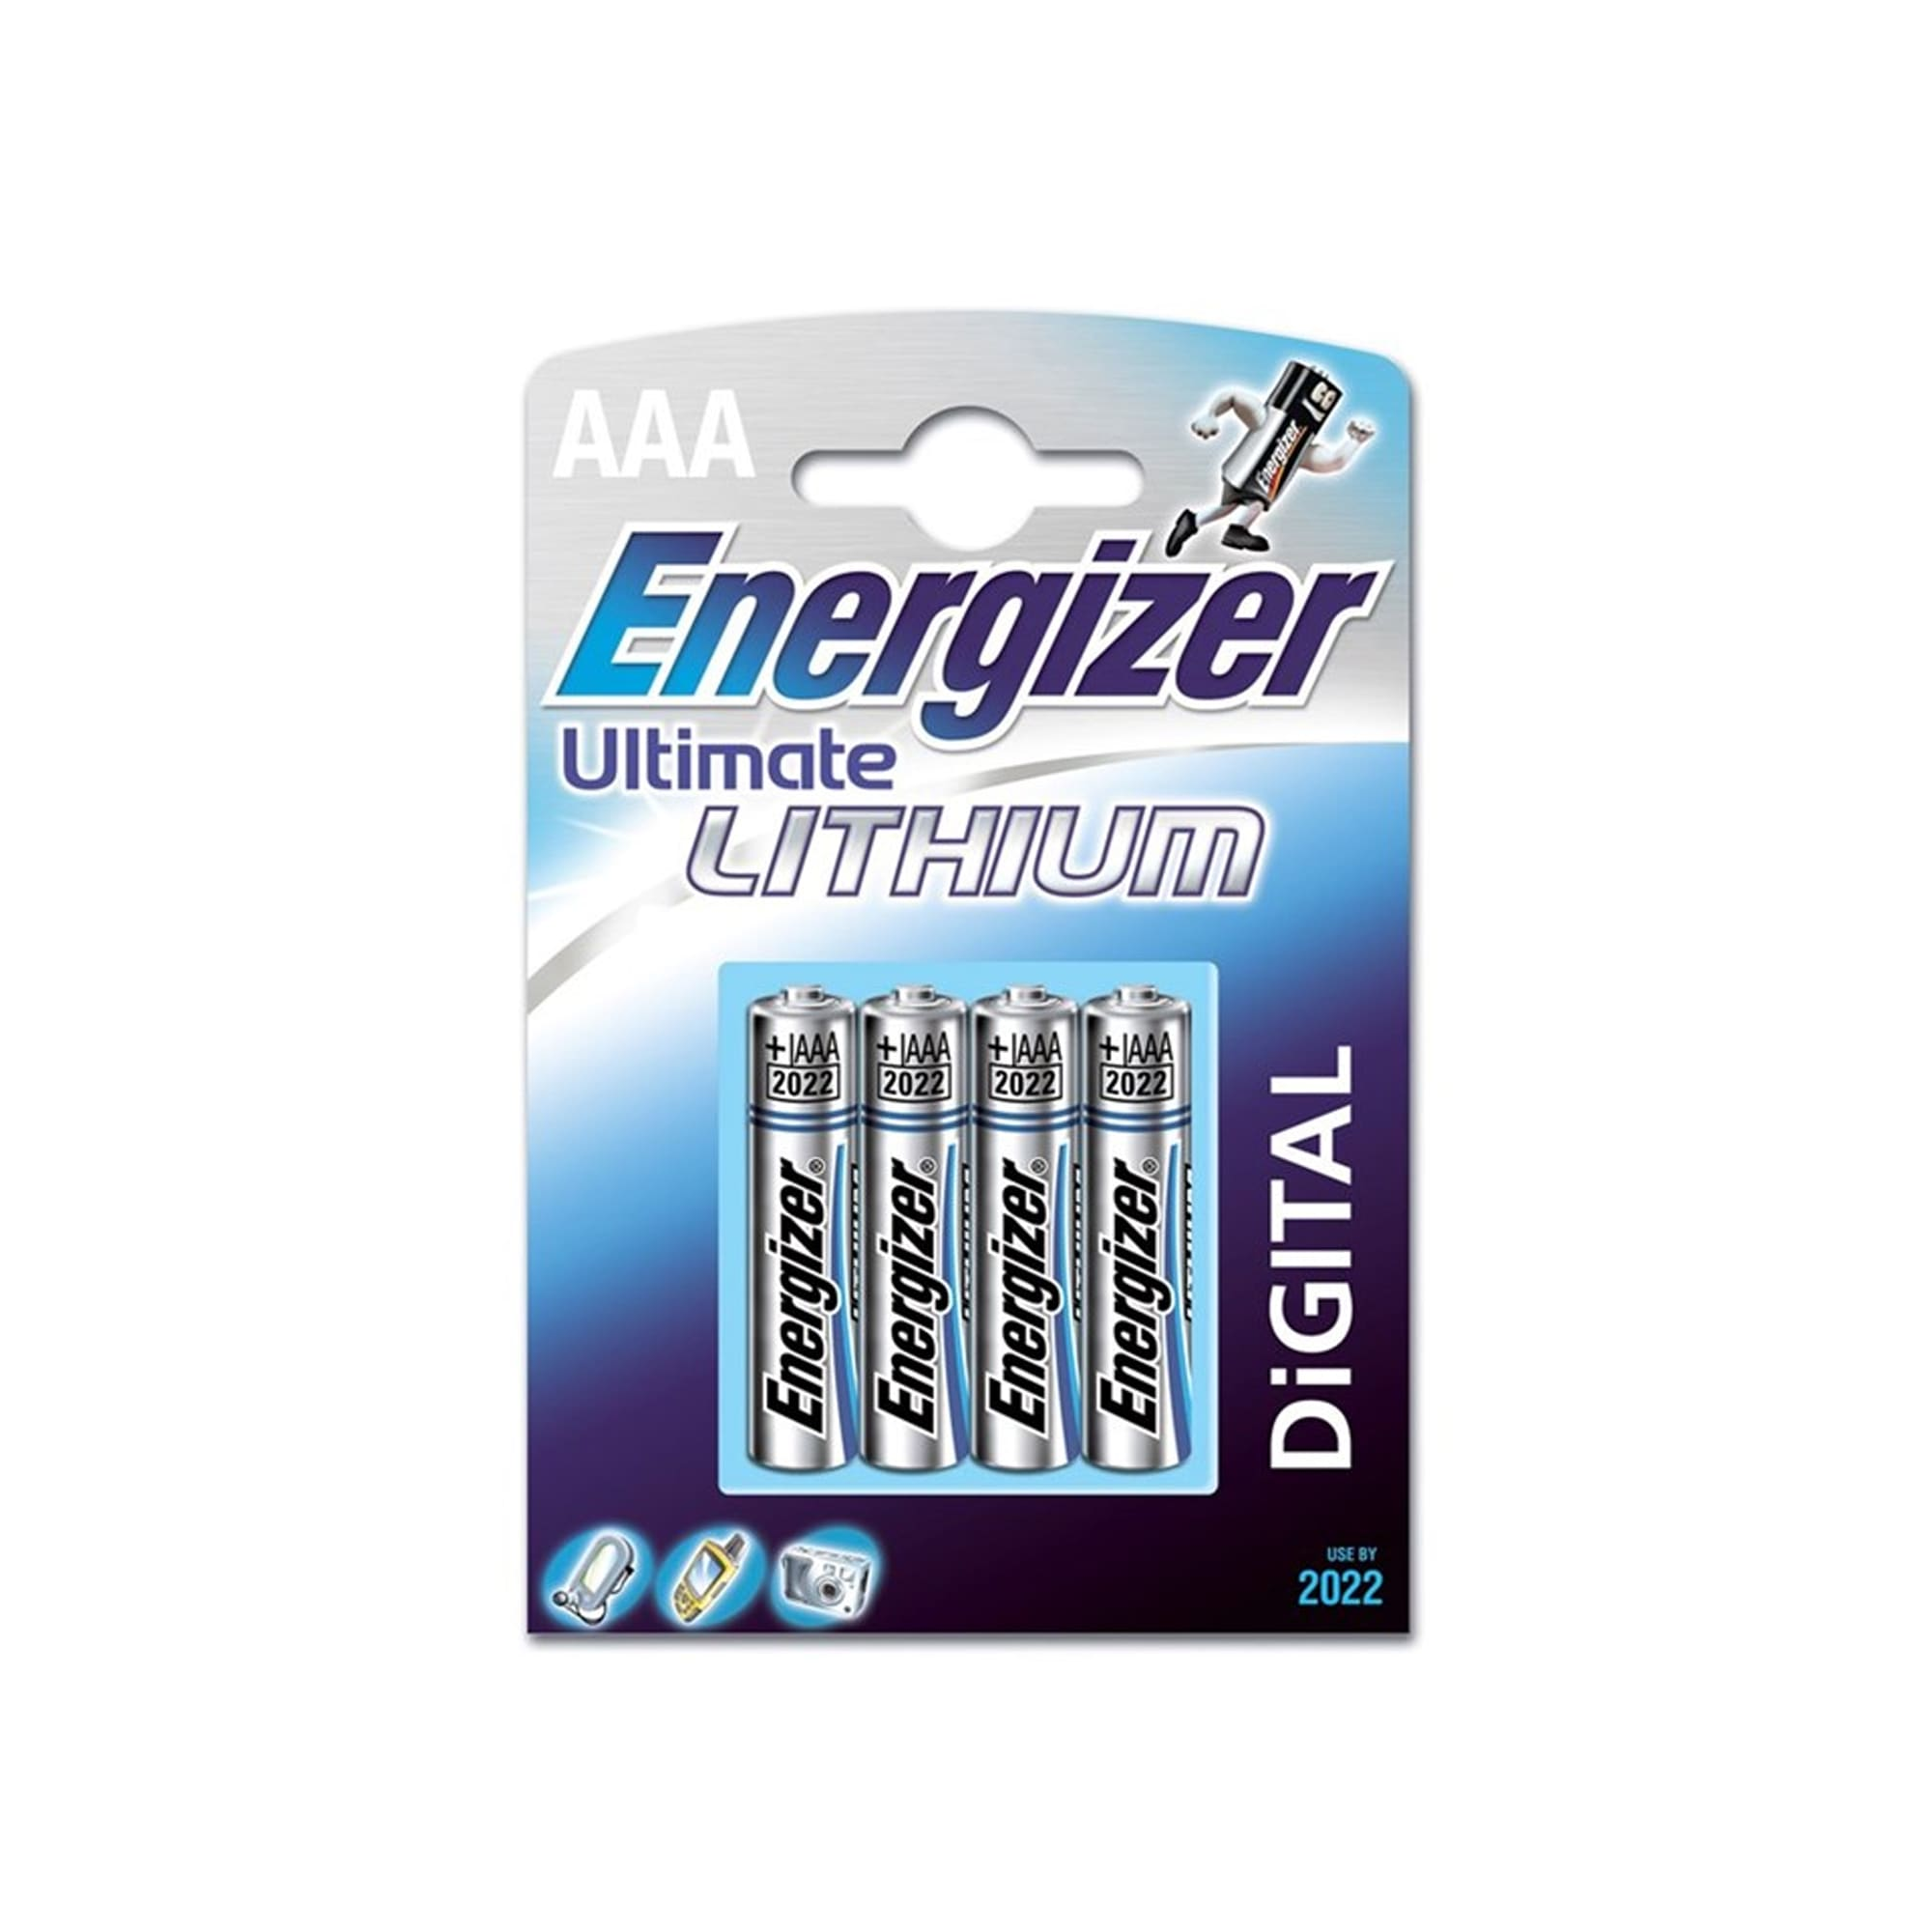 Energizer Ultimate Lithium AAA 4Pk